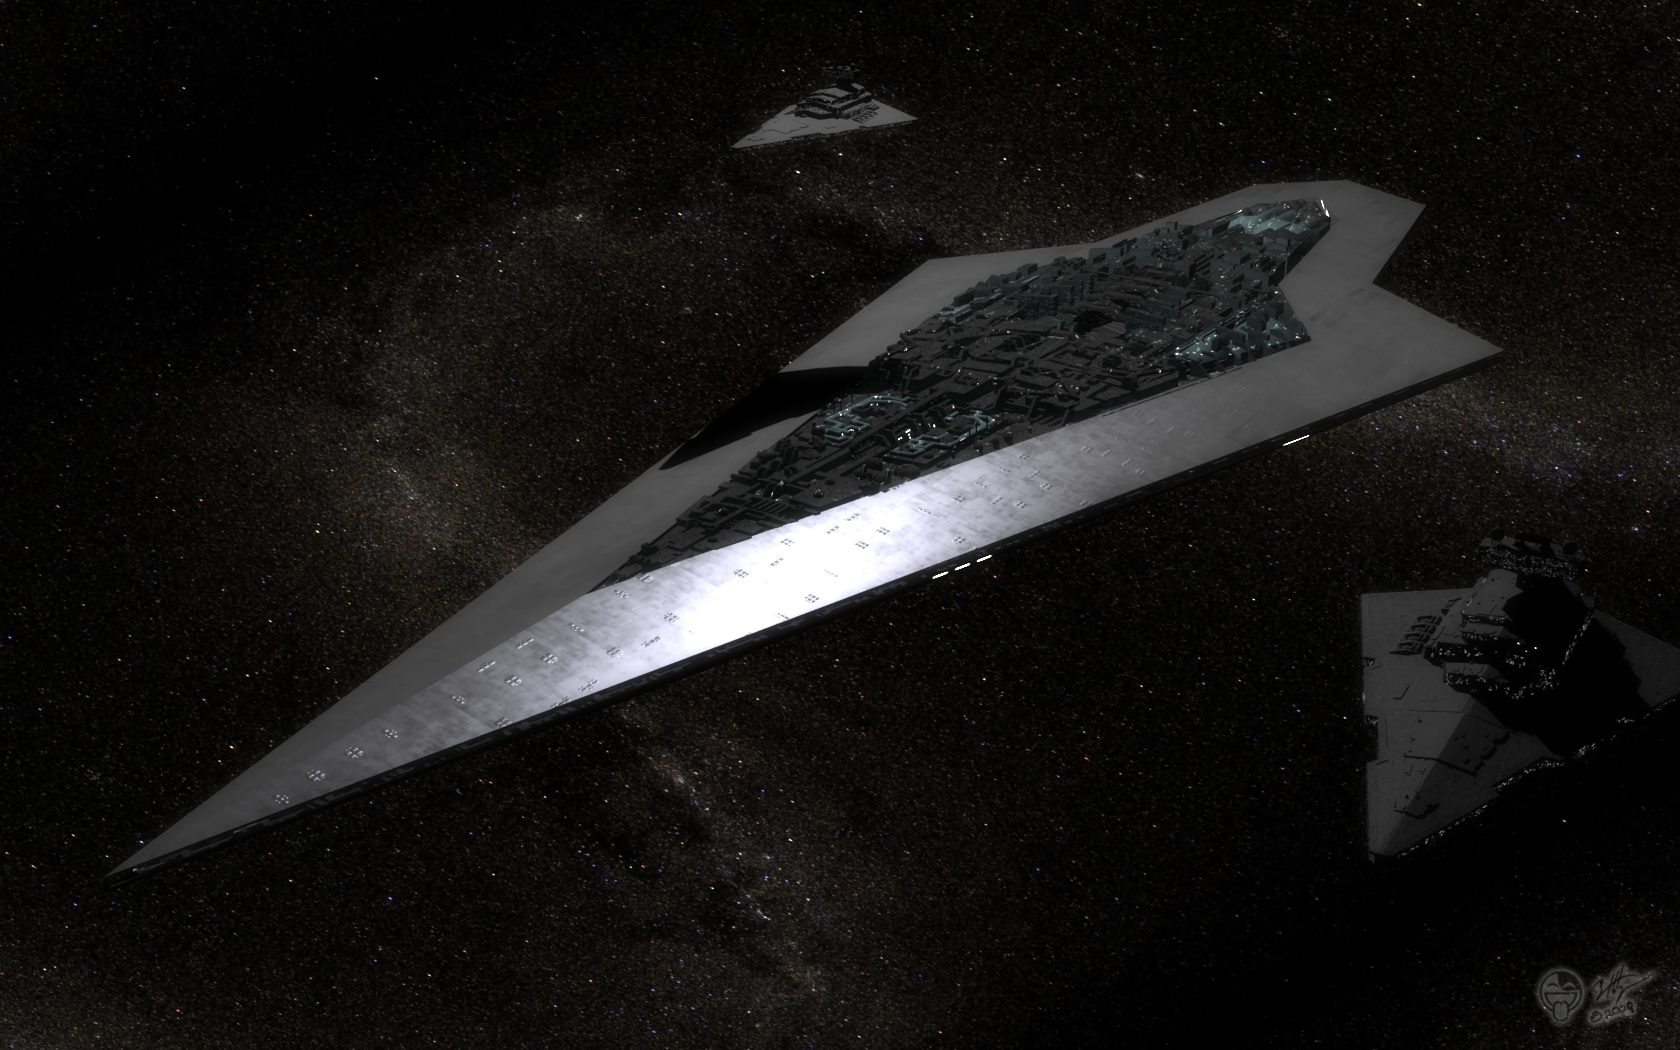 Sci Fi - Star Wars  Super Star Destroyer Executor Wallpaper